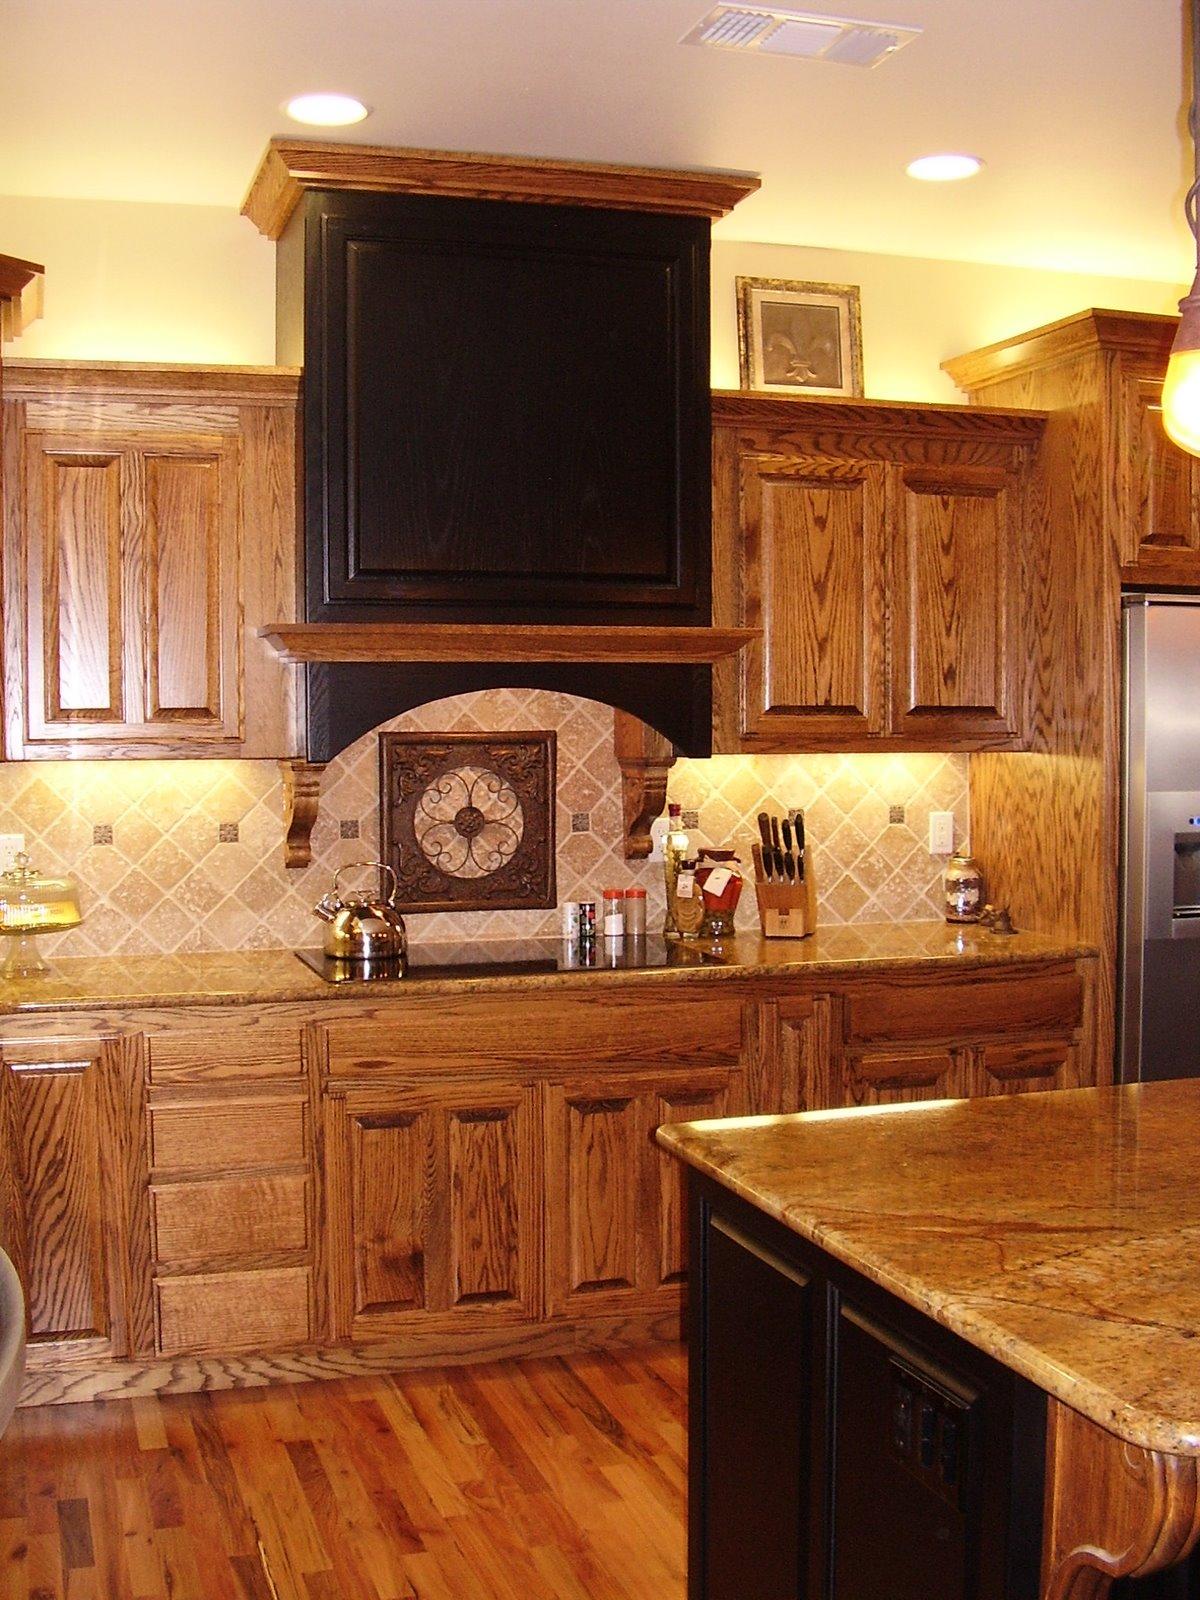 Scott River Custom Cabinets Dark Stained Oak Painted Black Raised Panel Doors